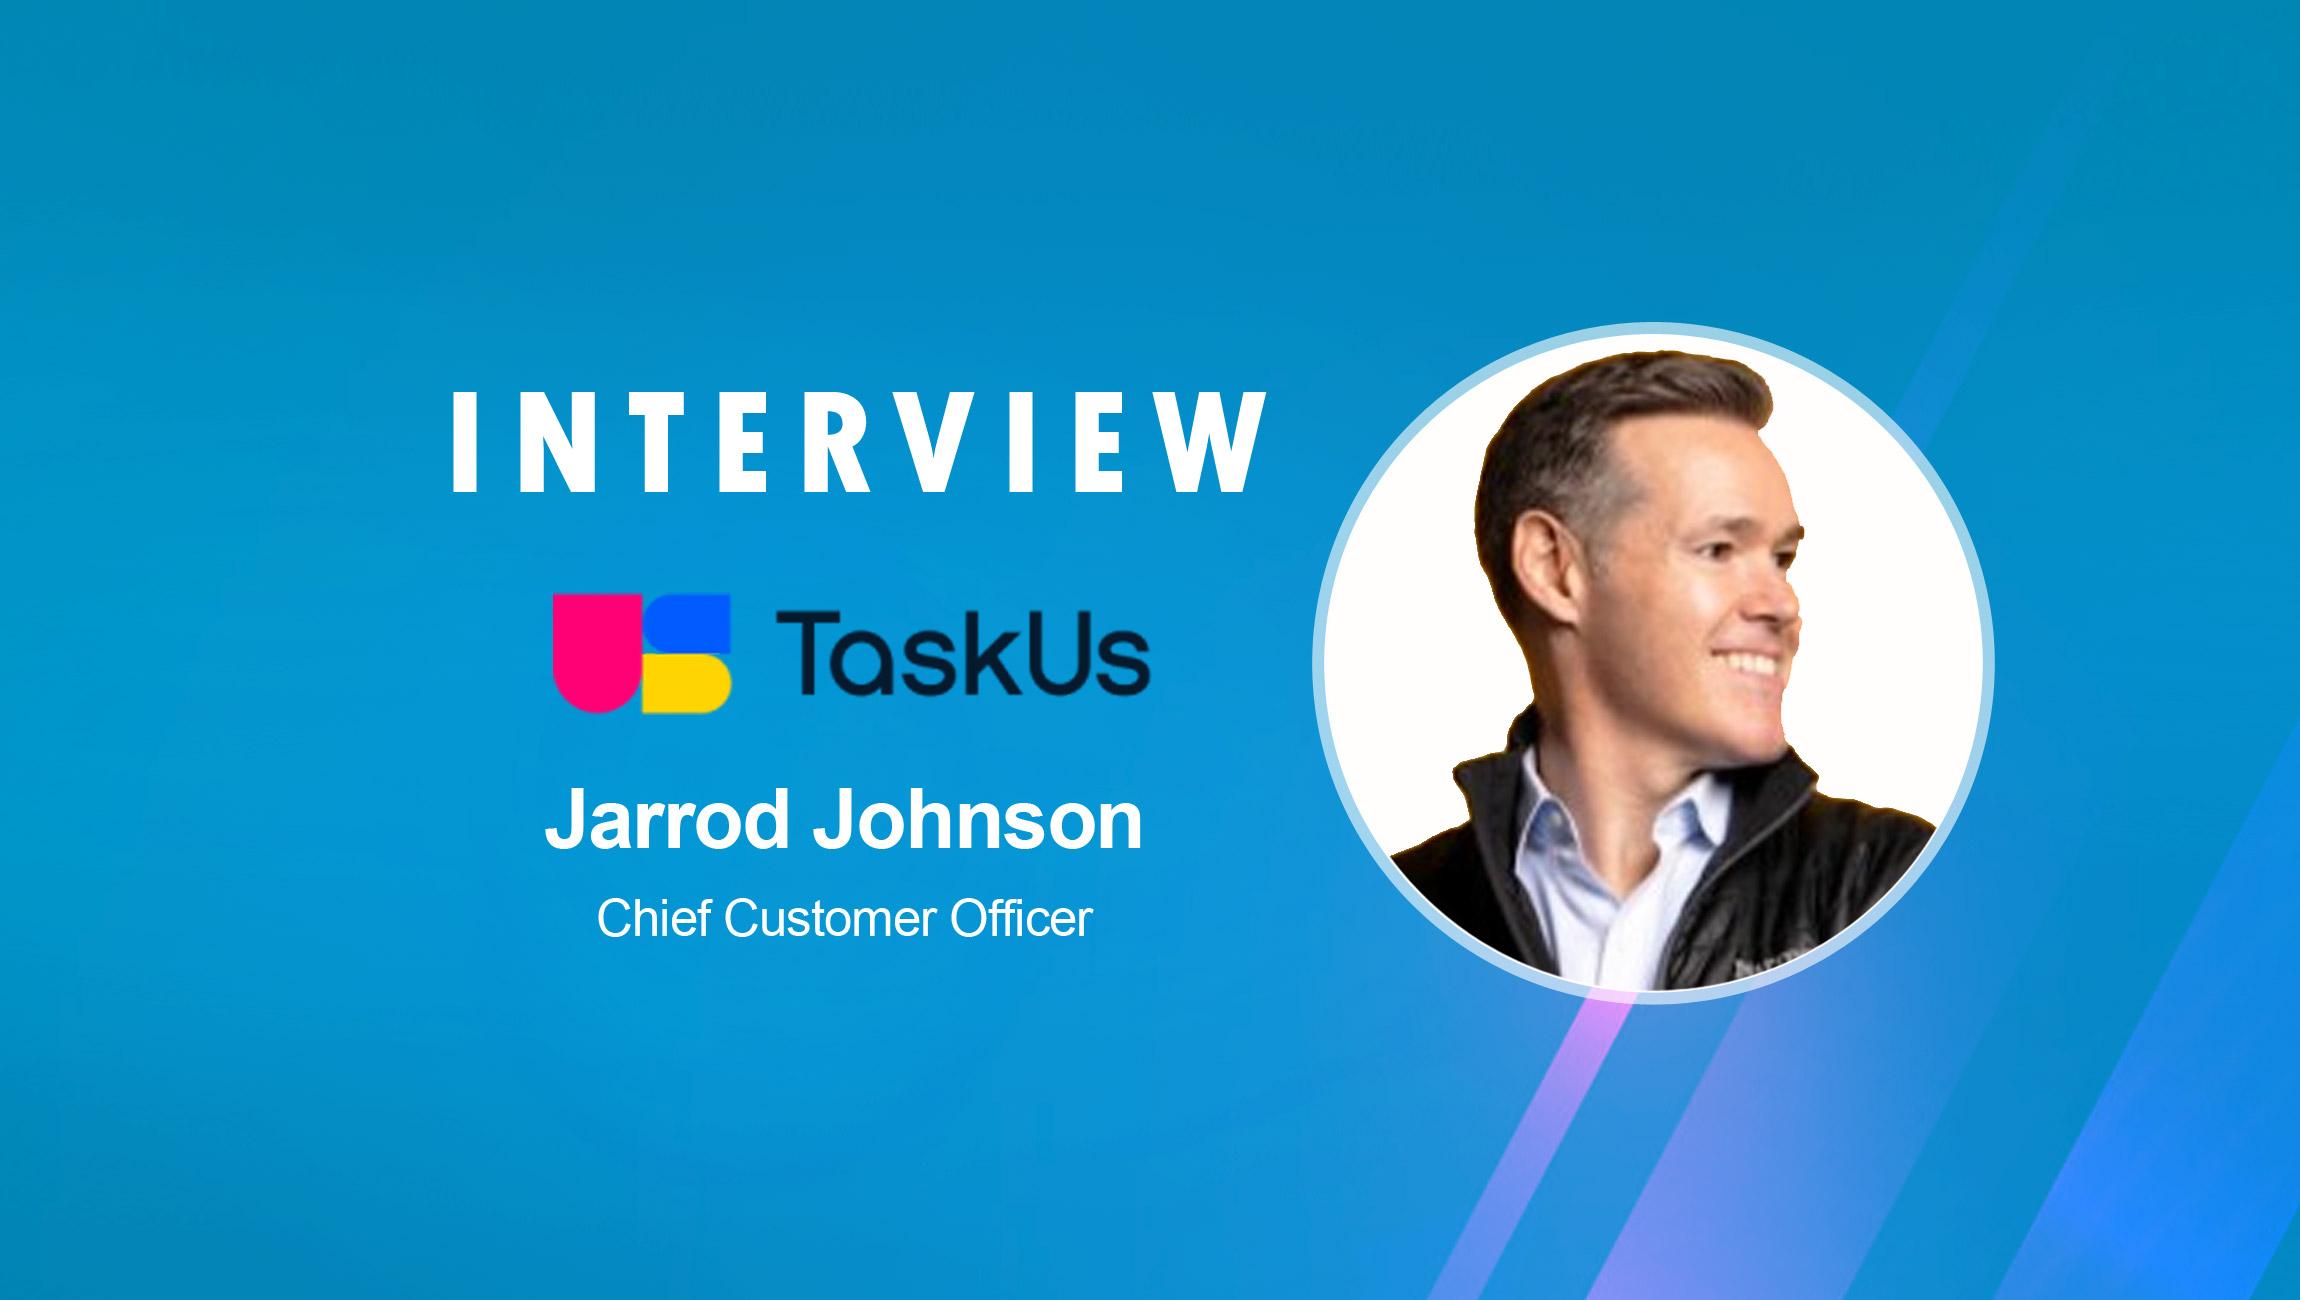 SalesTechStar Interview with Jarrod Johnson, Chief Customer Officer at TaskUs